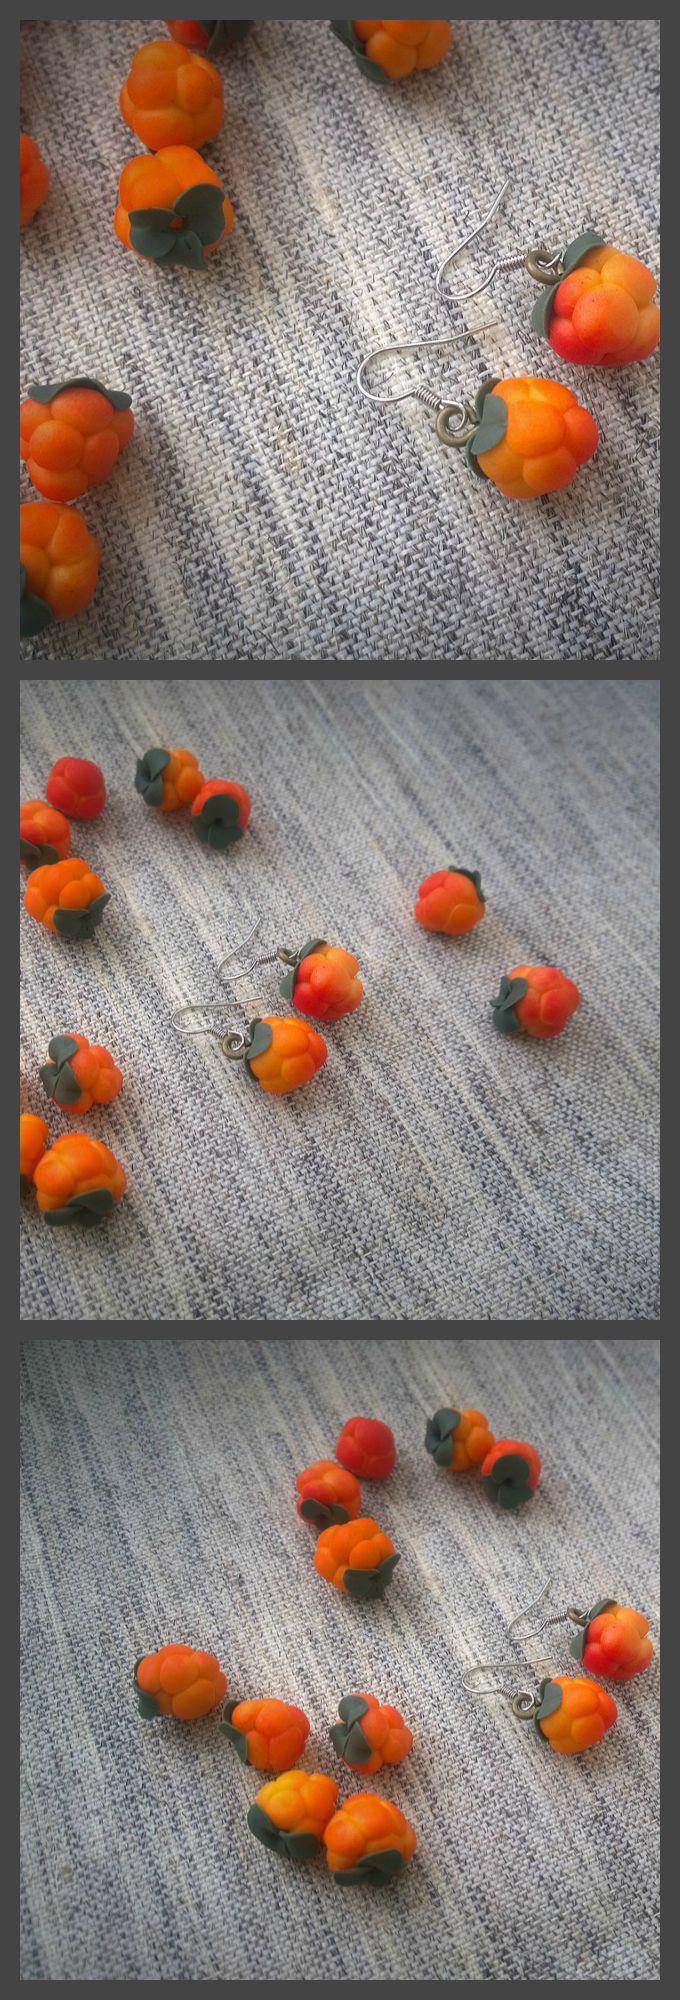 Berry от Silverushka #полимернаяглина #хобби #ручнаяработа #ягоды #зима  #морошка #polymerclay #fimo #premo #berries #cloudberry #etsy  #handmade #wildberries #food #summer #sculpey #silverushka